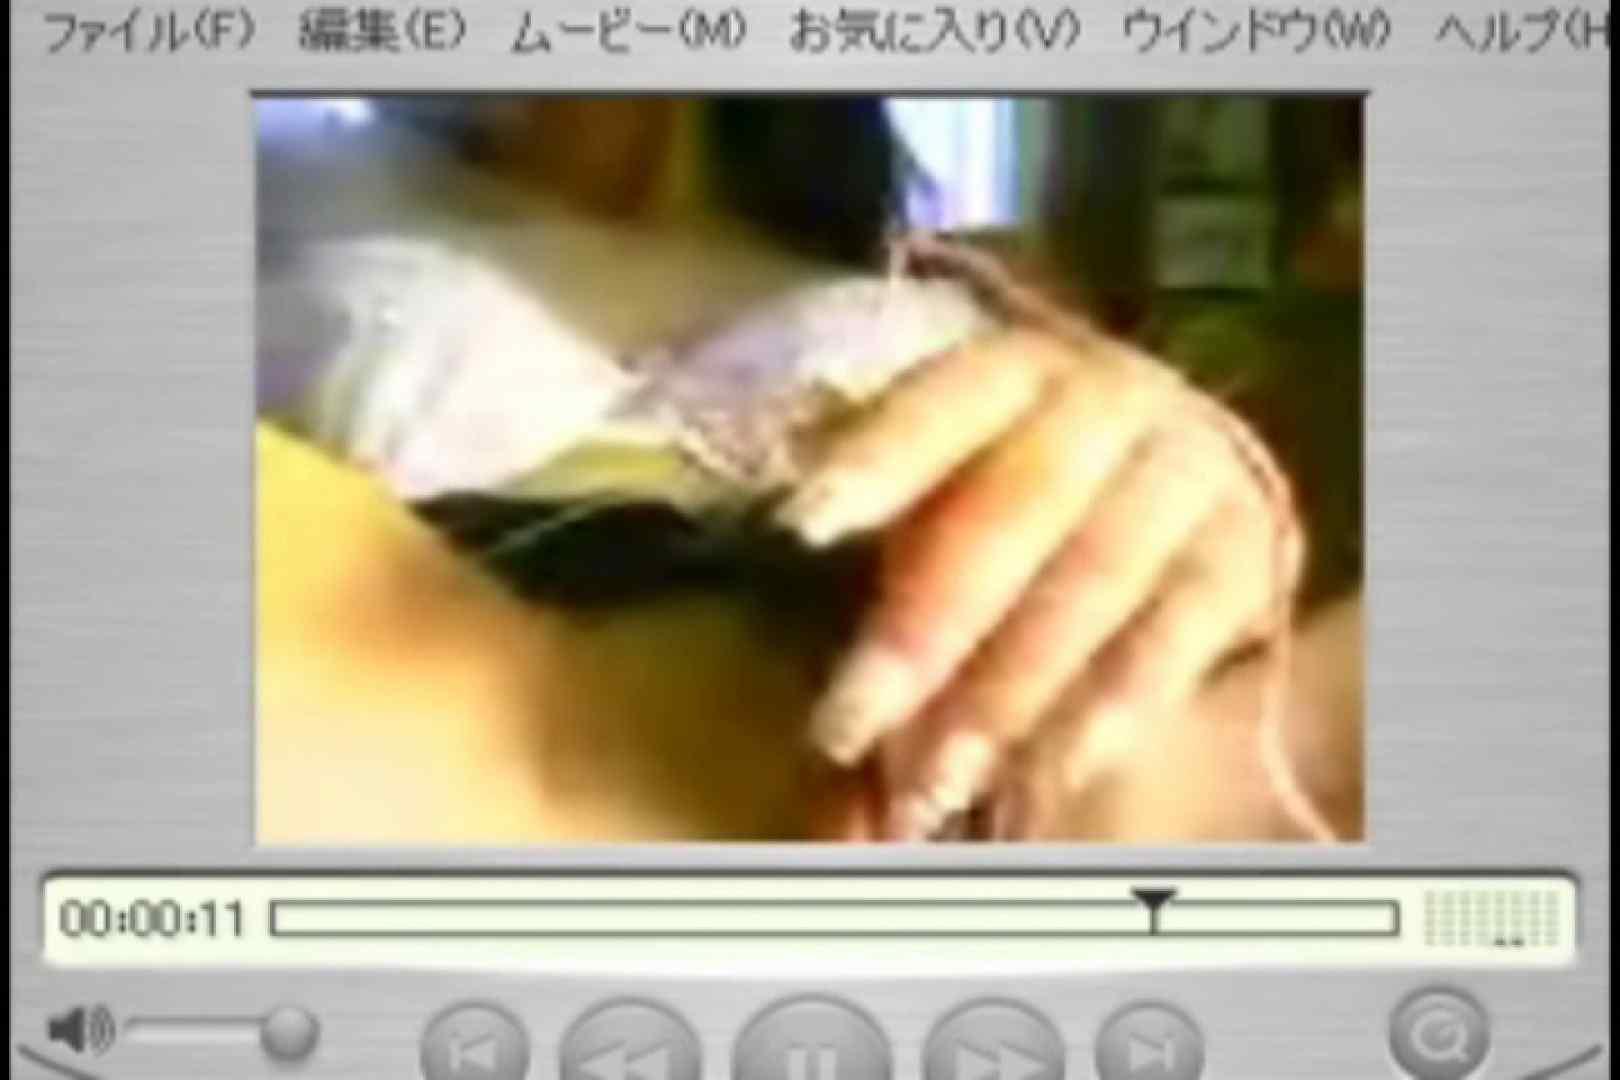 Shigeruのアルバム 流出作品  68pic 20